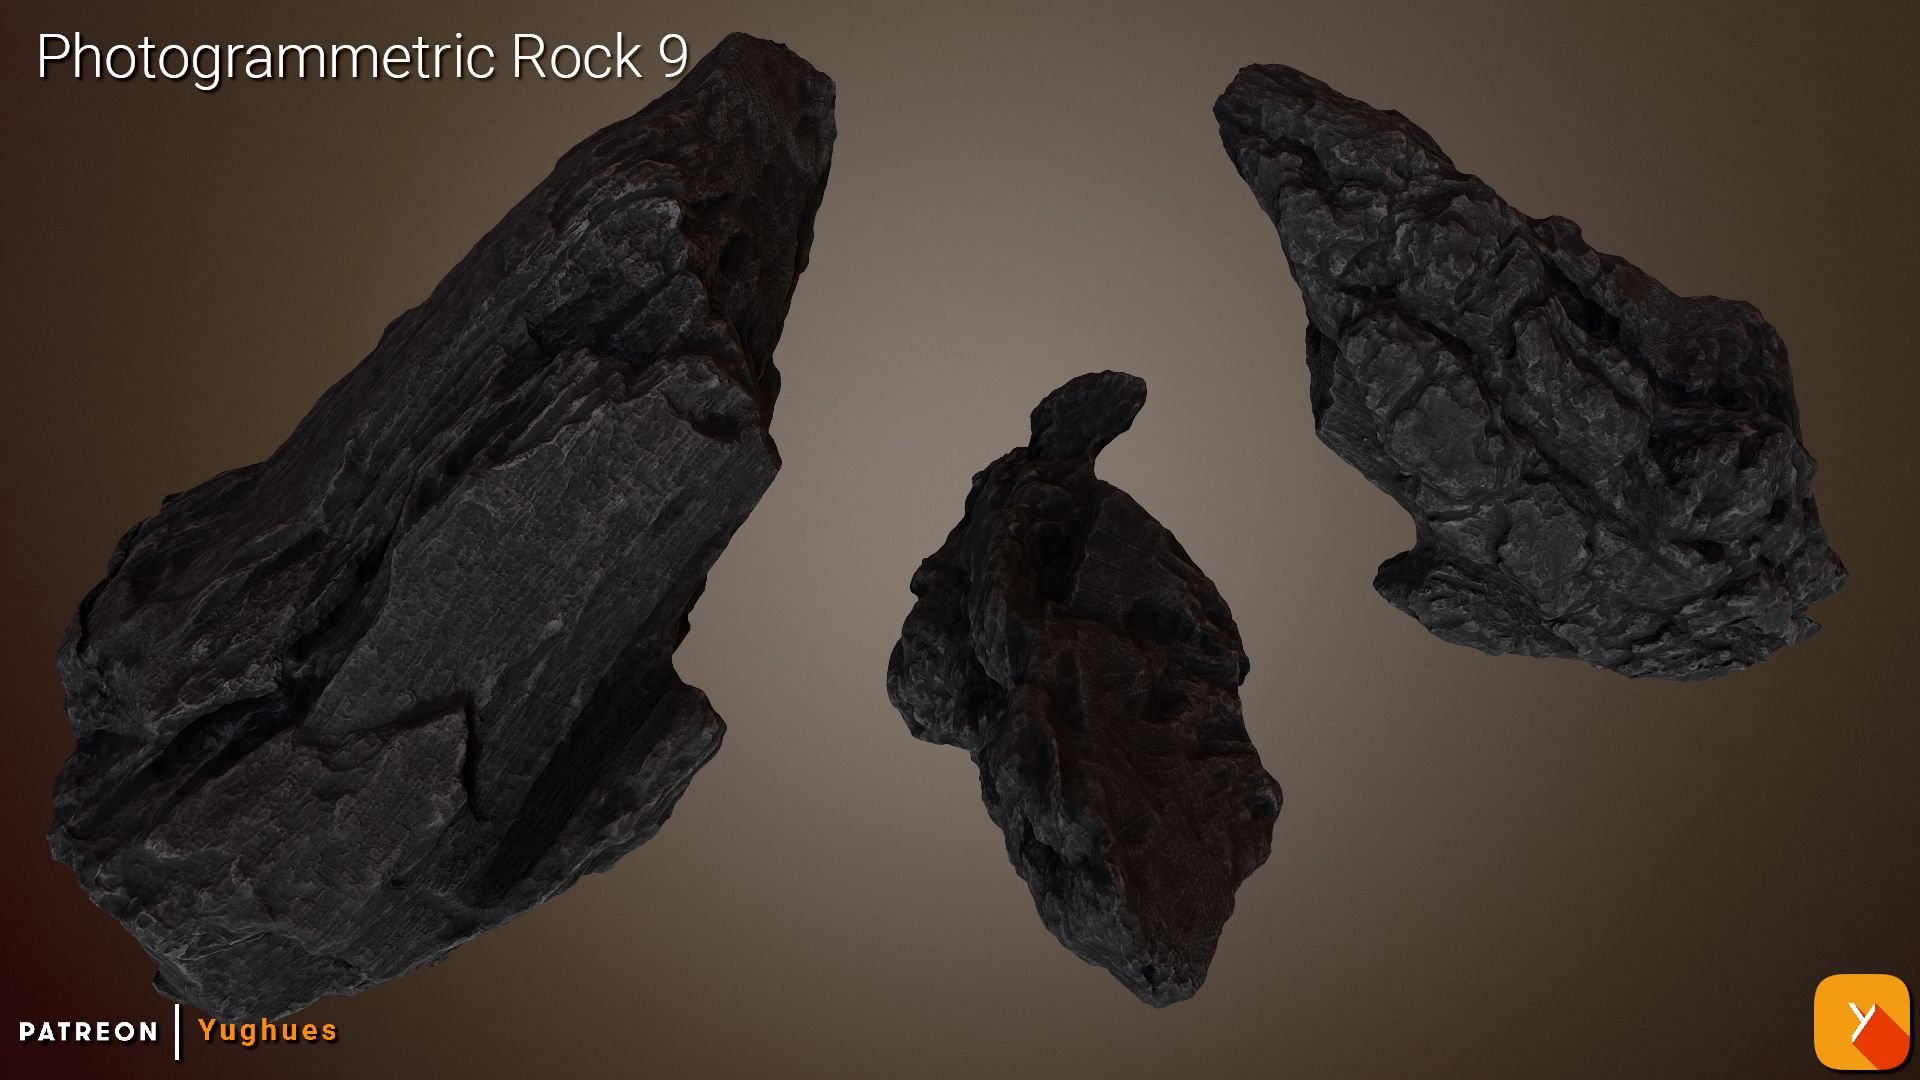 [Free] Photogrammetric Rock 9